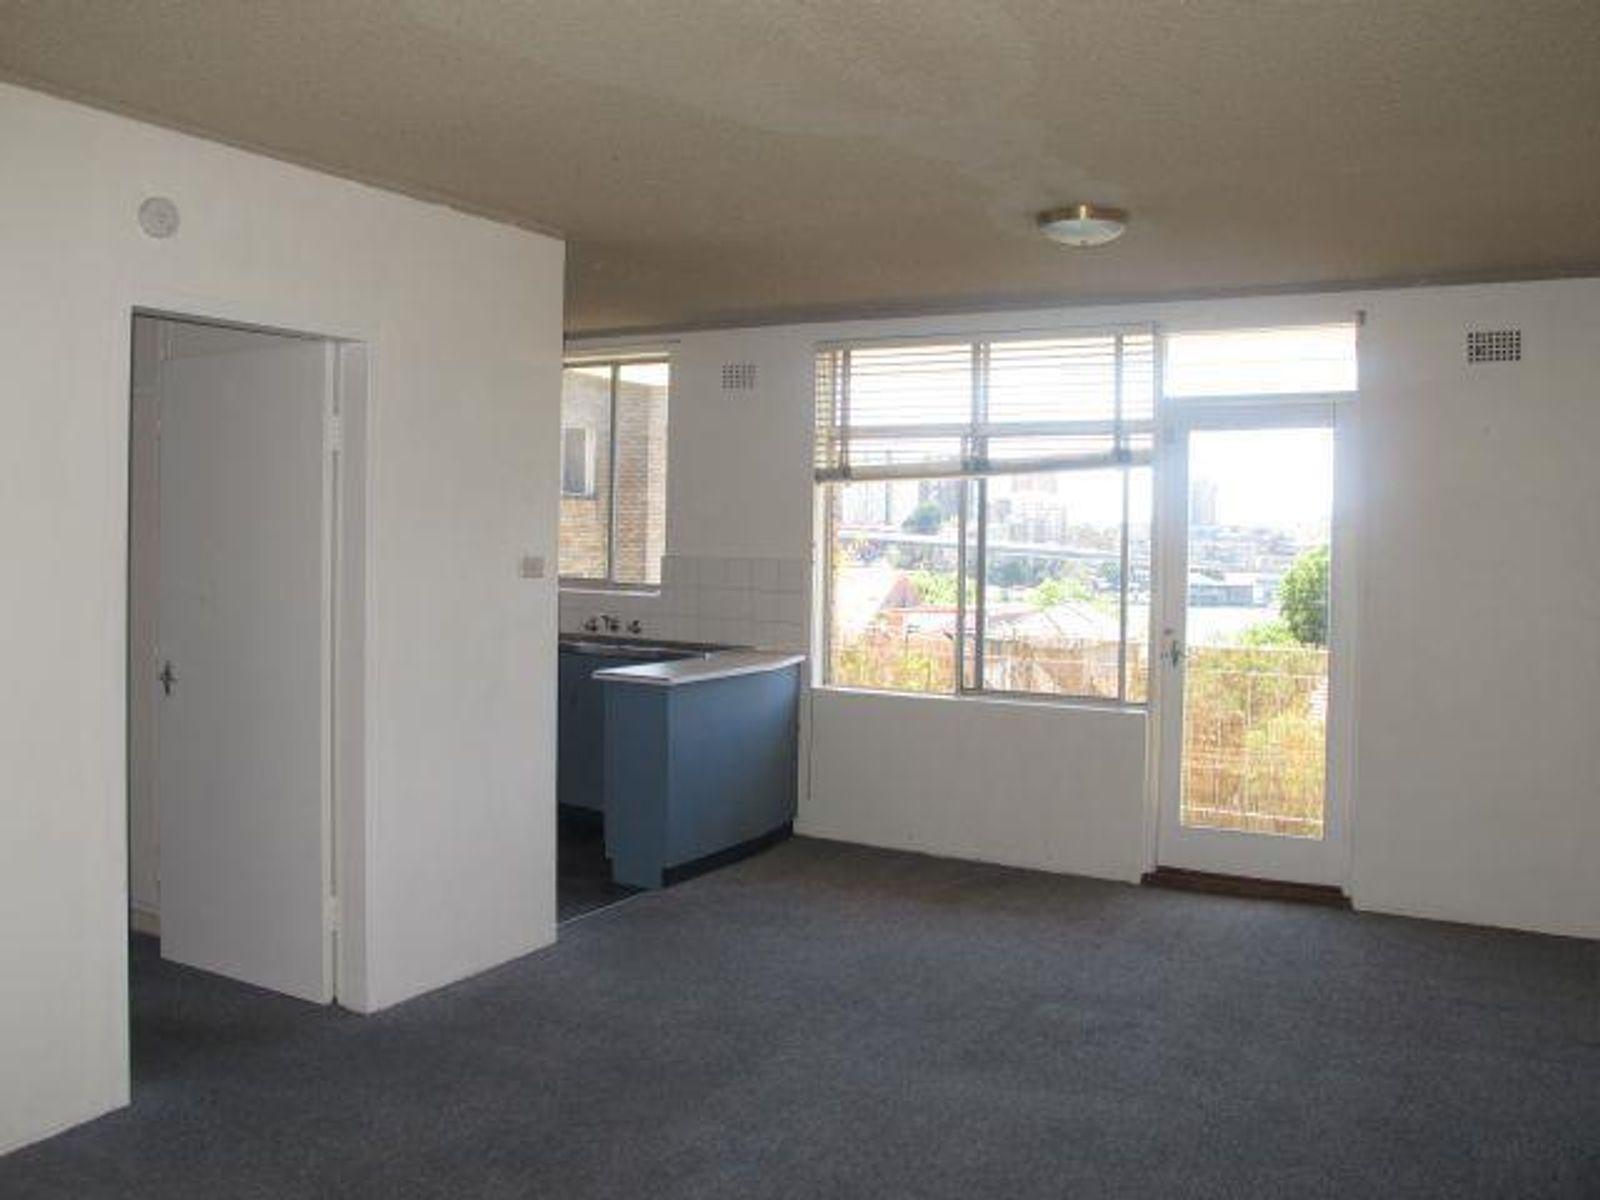 8/3 Charlton Way, Glebe, NSW 2037